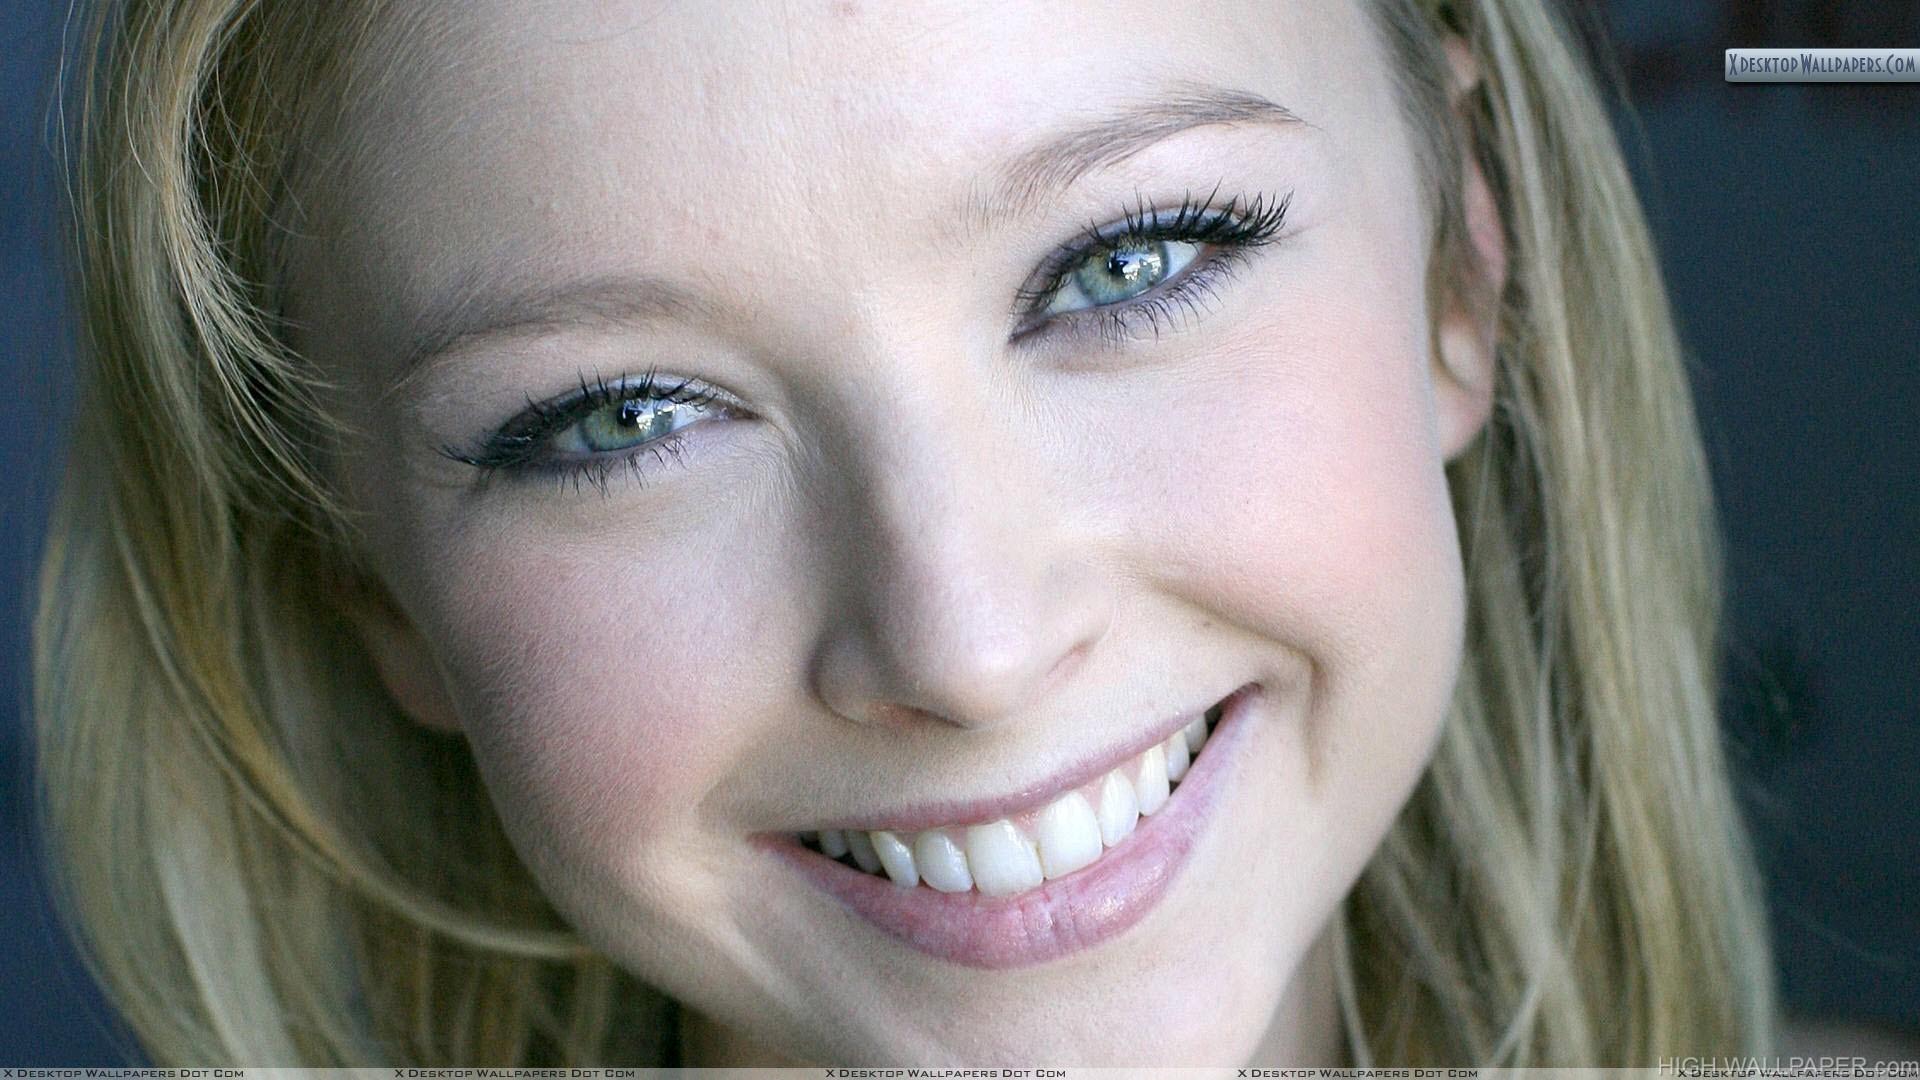 Elisabeth Harnois Smiling Cute Face Closeup